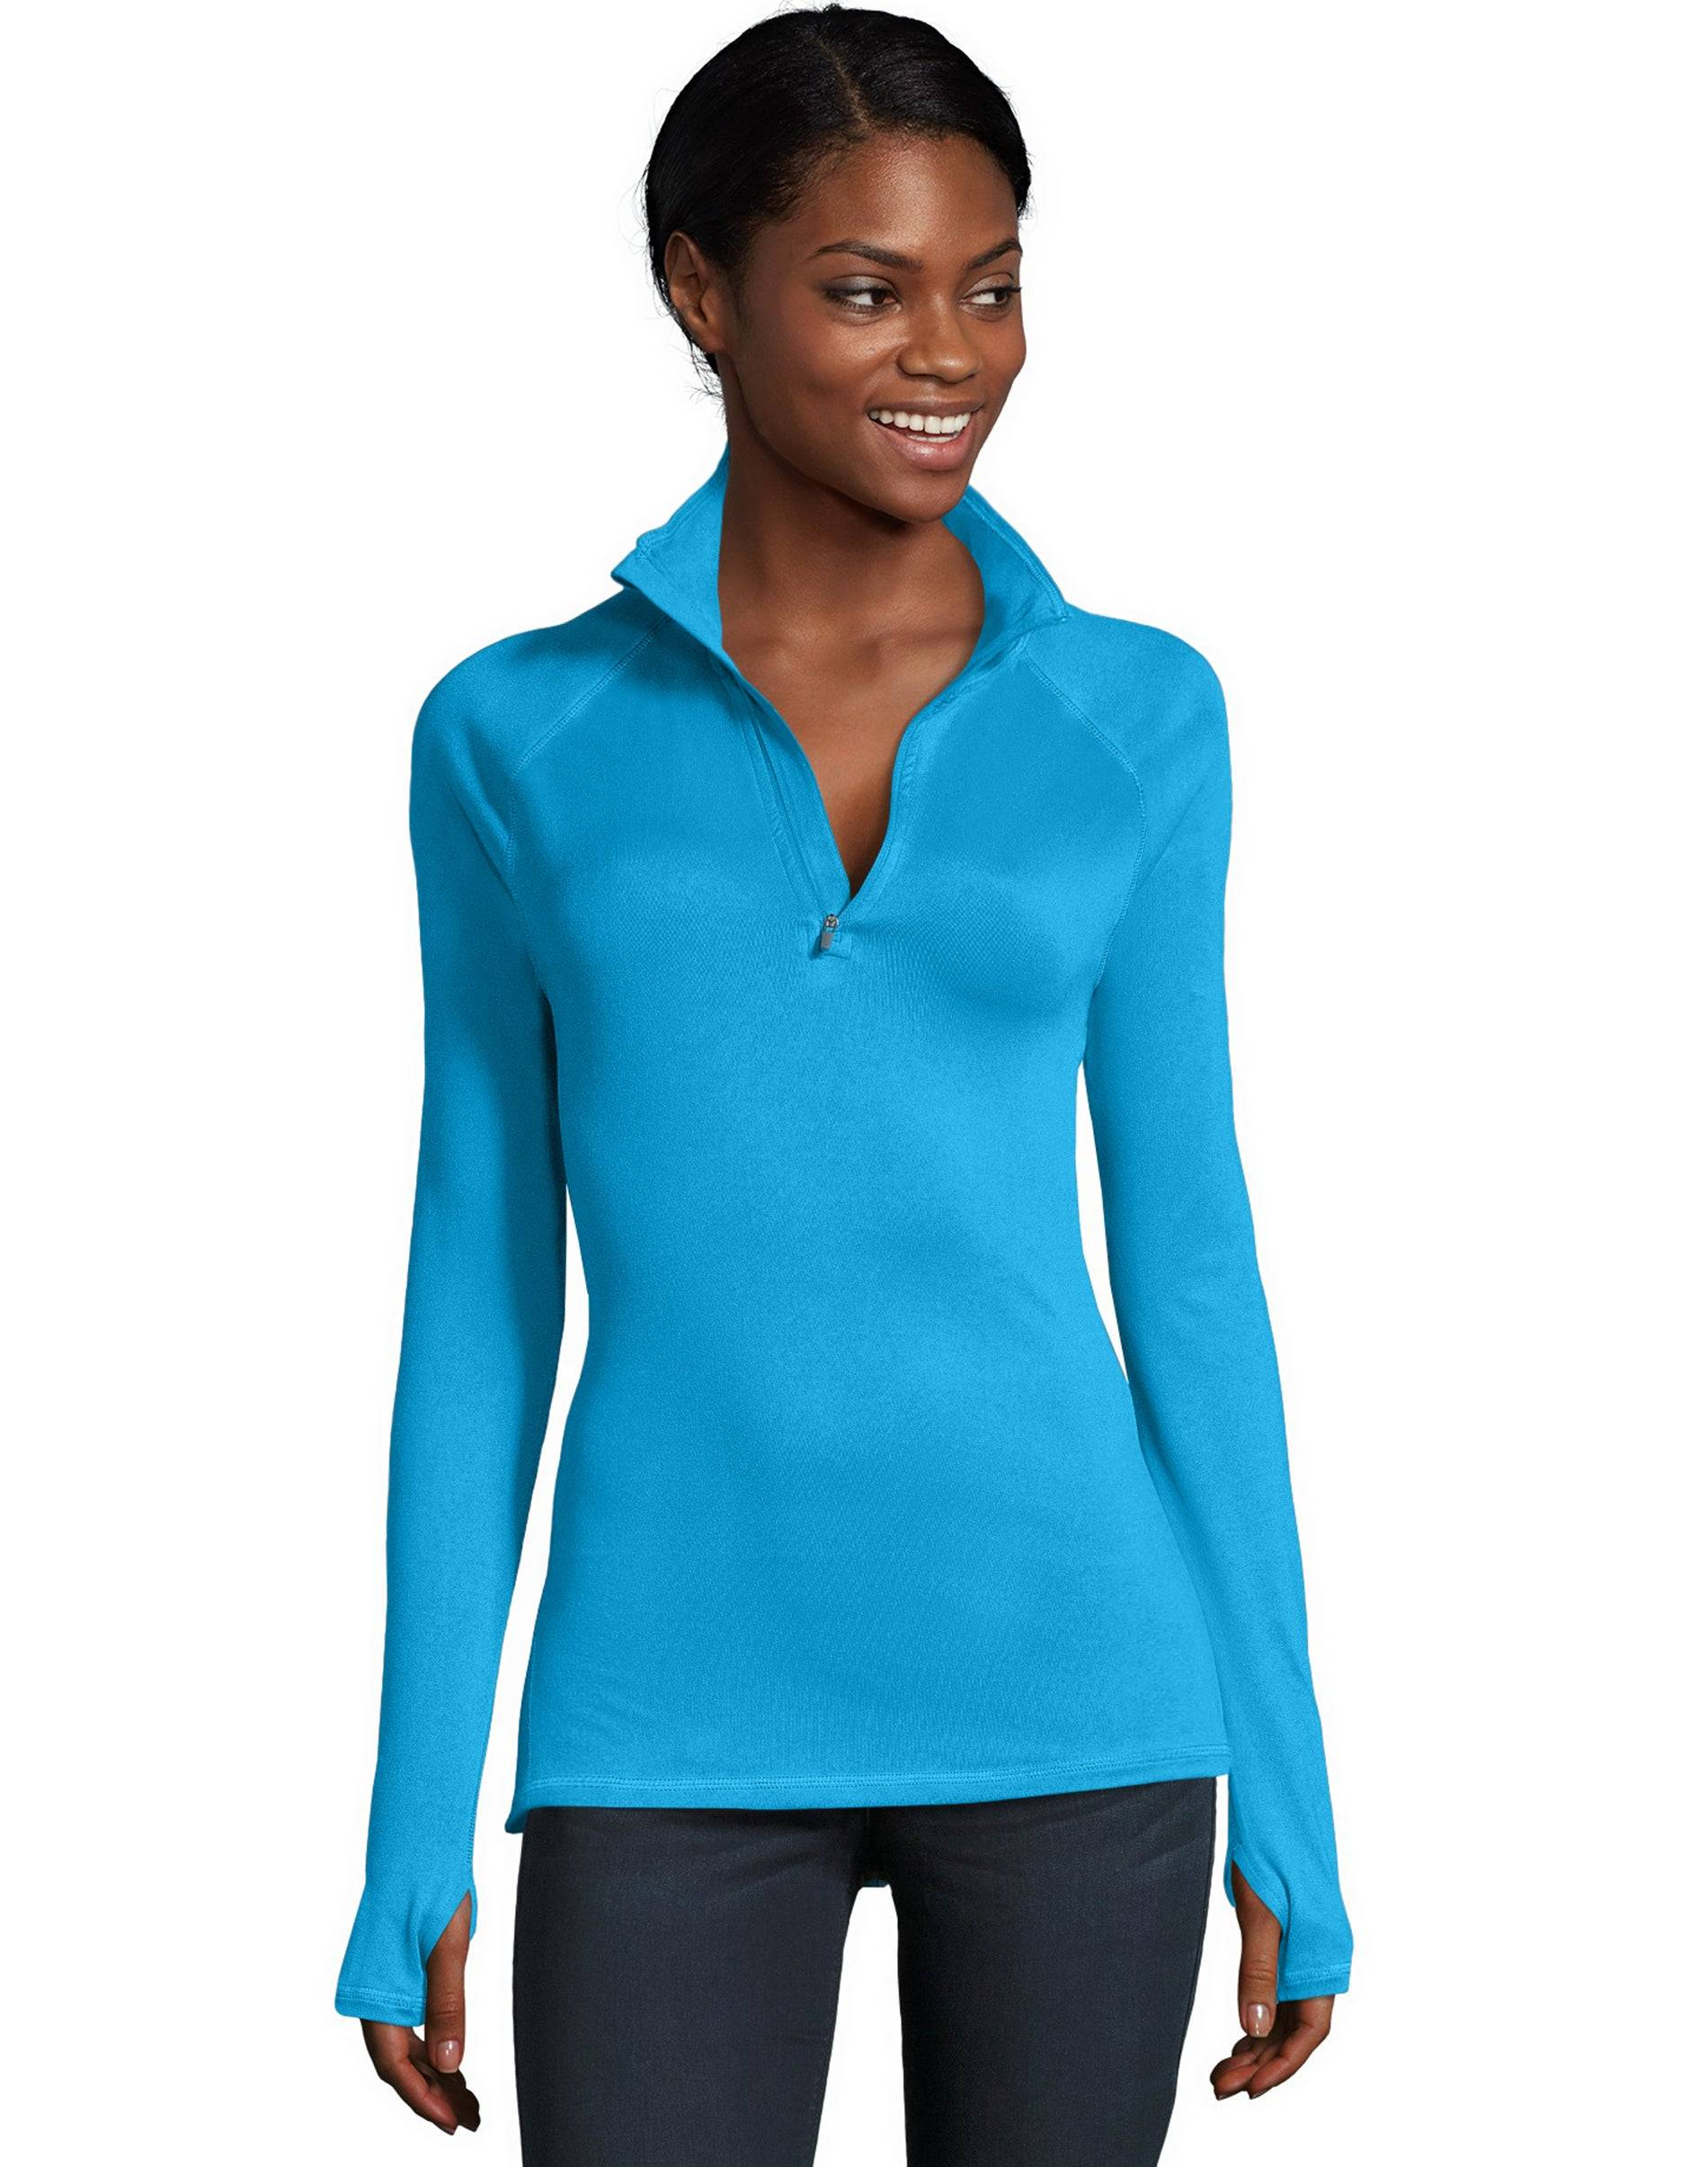 Hanes Sport Women's Performance Quarter Zip Sweatshirt Underwater Blue 2XL